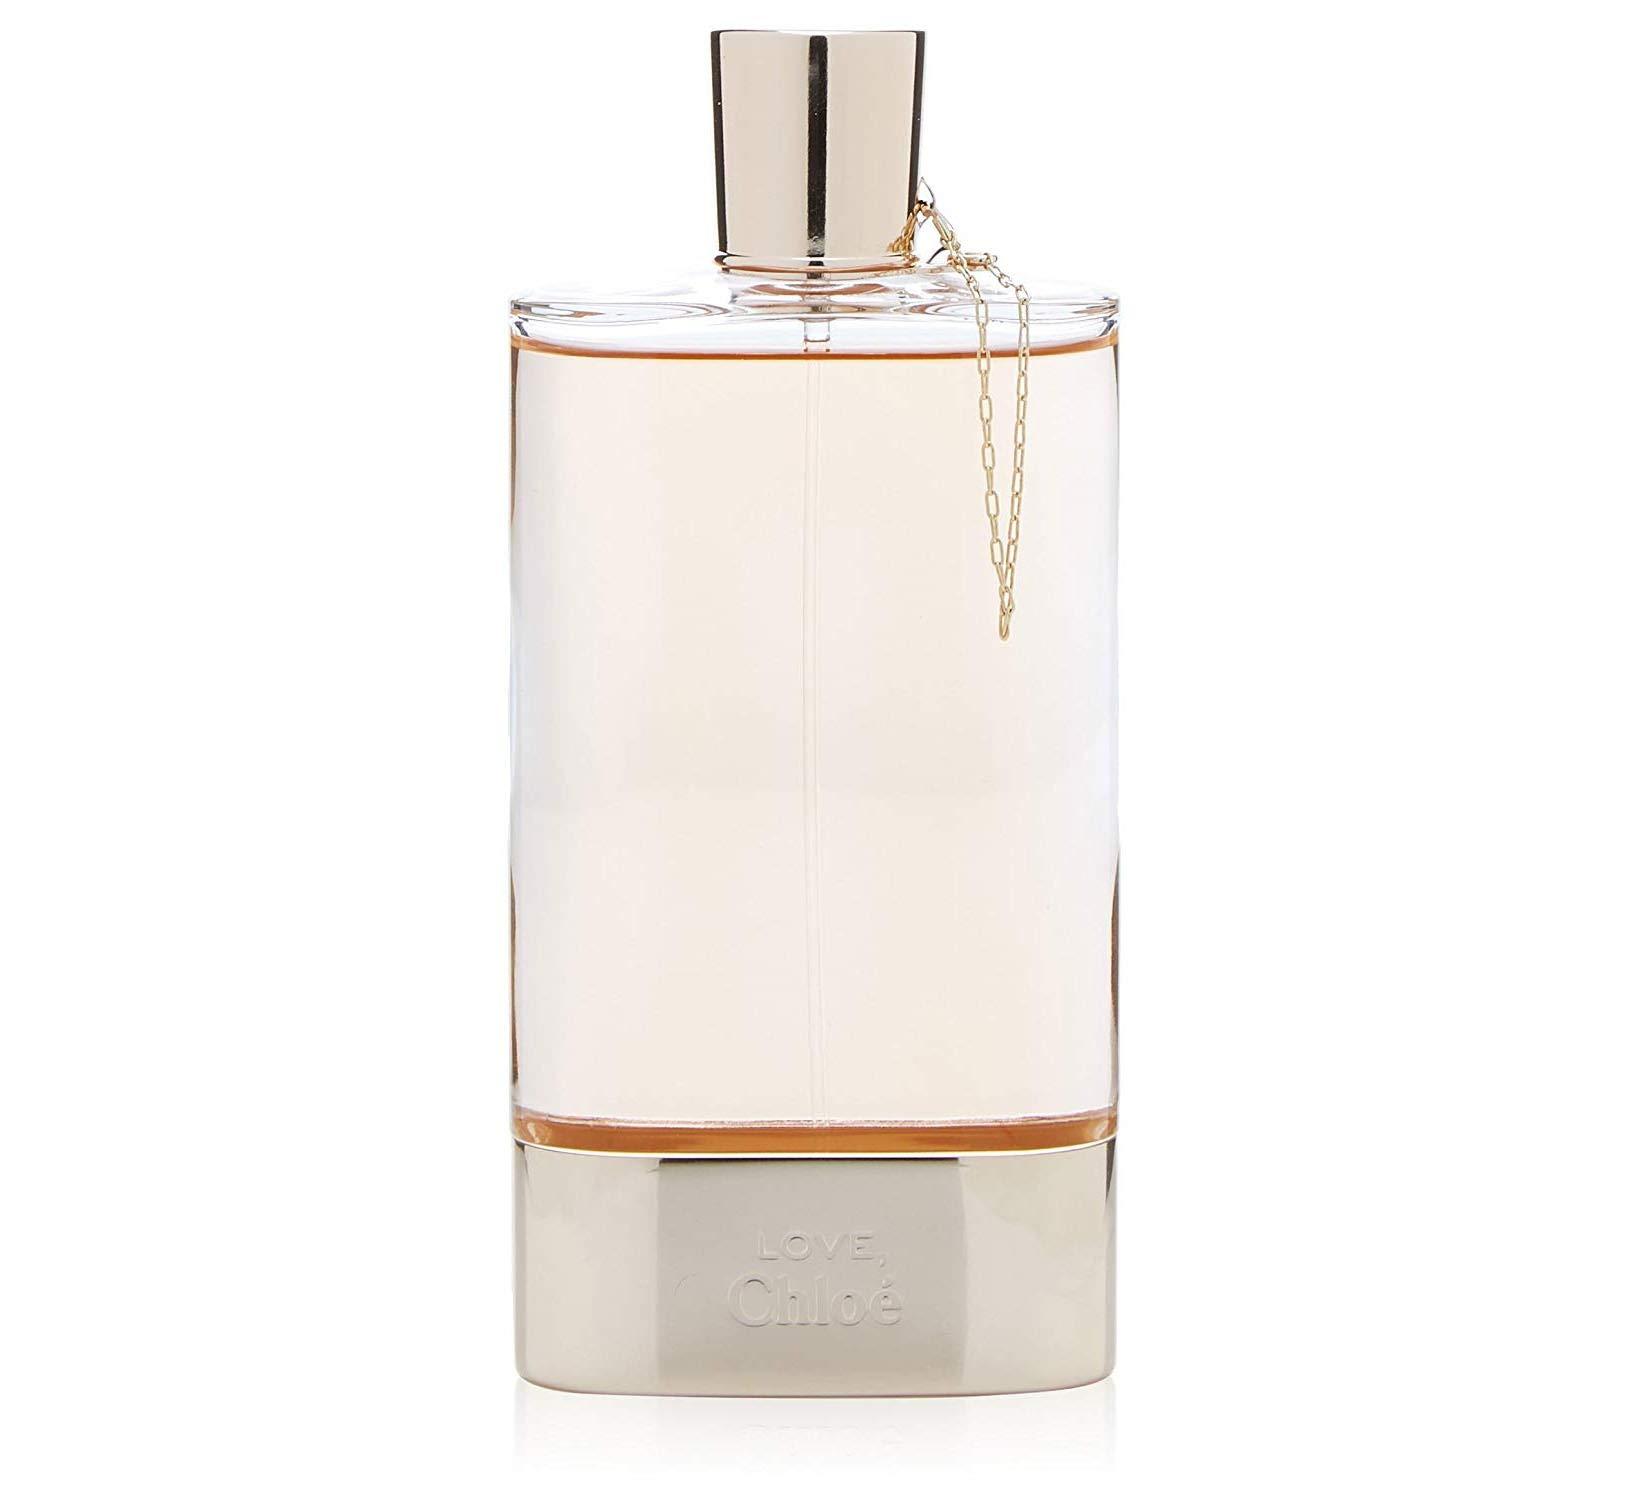 Love by Chloe for Women, Eau de Parfum Spray, 2.5 Ounce